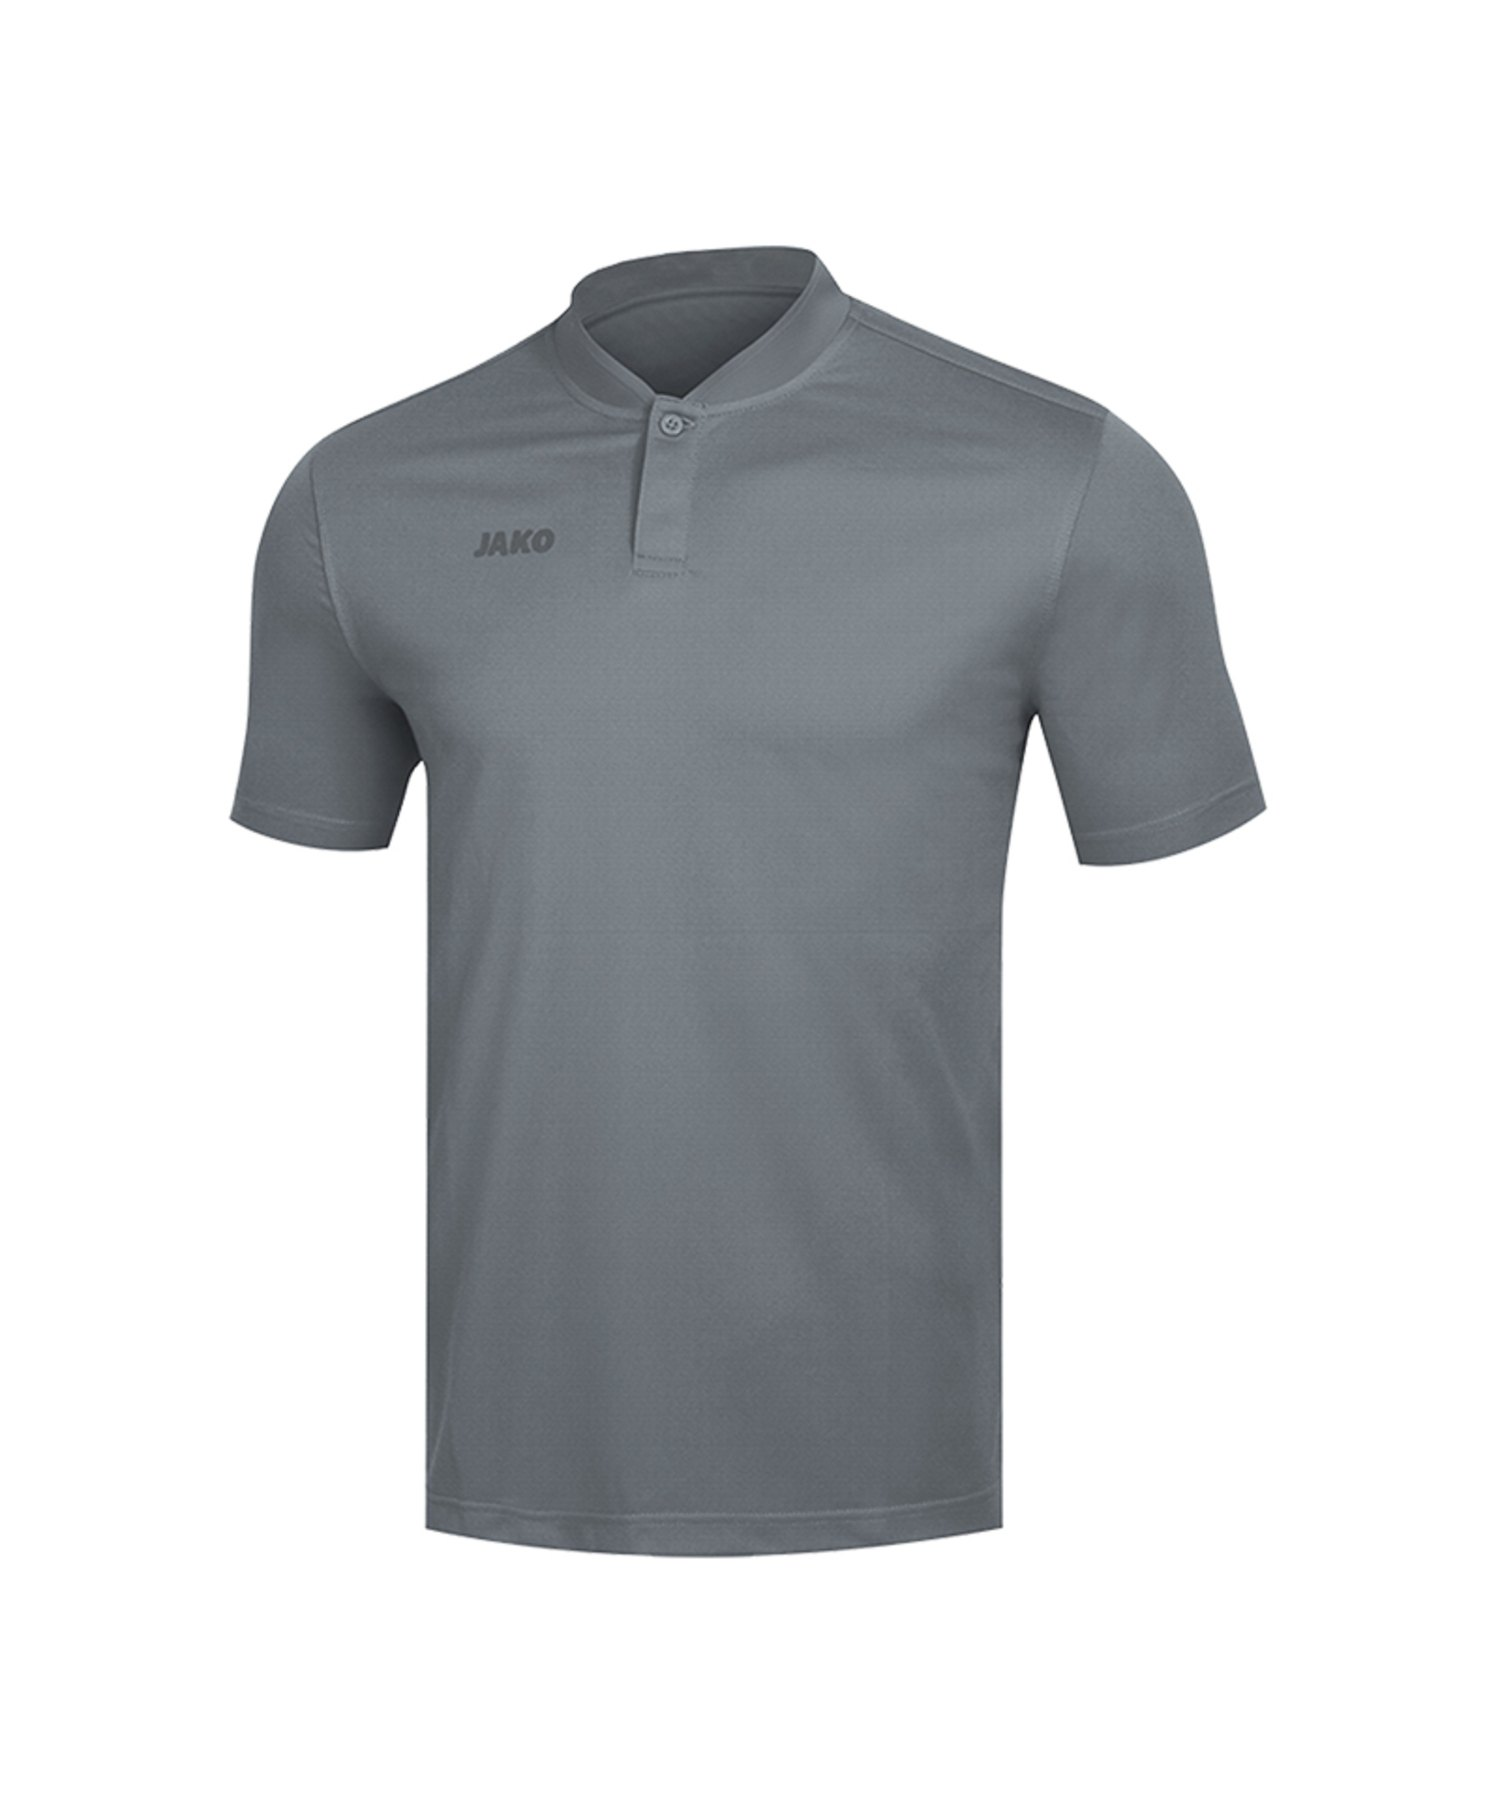 Jako Prestige Poloshirt Grau F40 - Grau